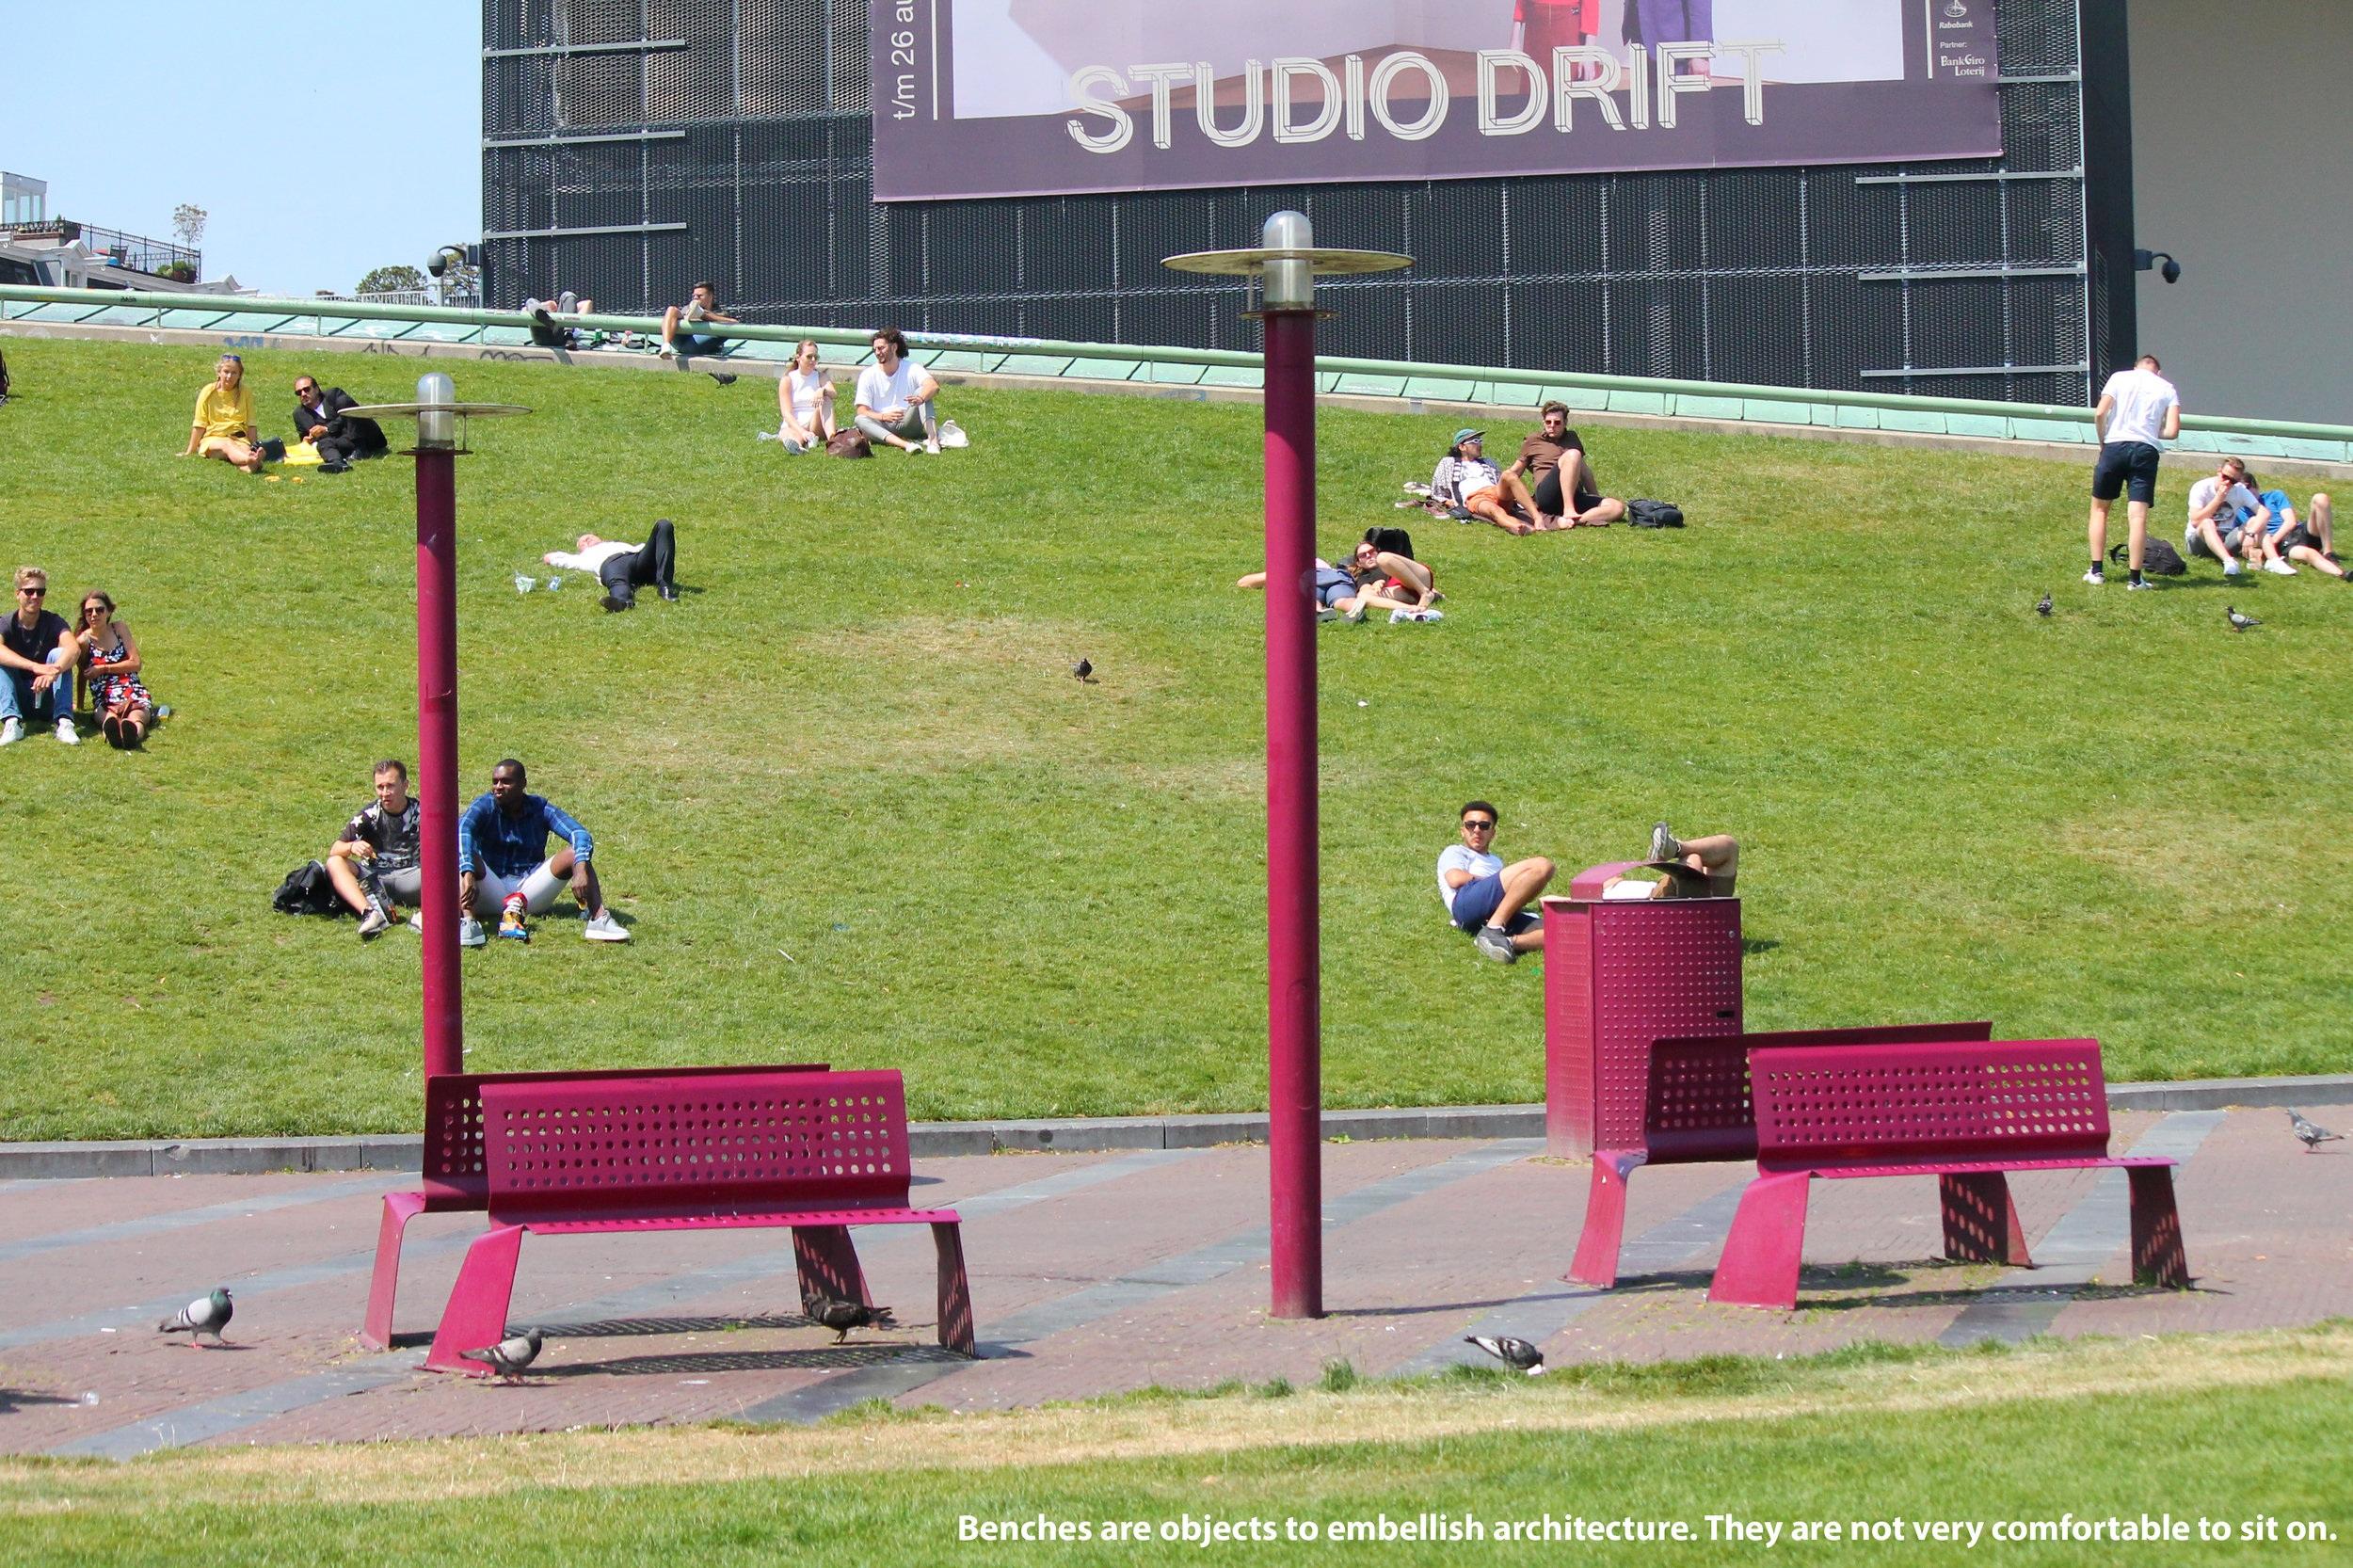 Placemaking_benches_placemakingplus.jpg